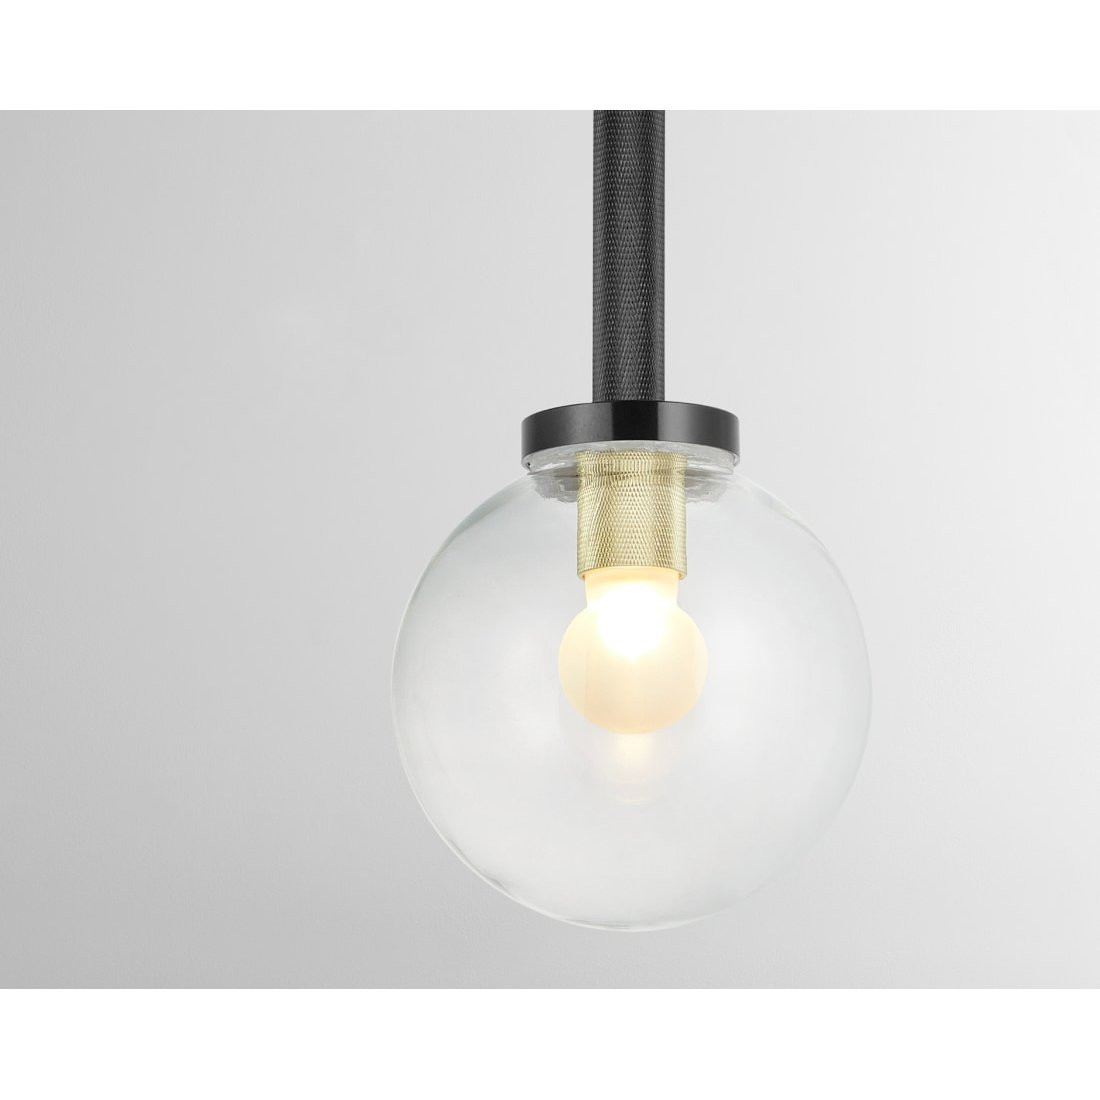 image-Vaughn Bathroom Pendant Lamp, Black and Brushed Brass